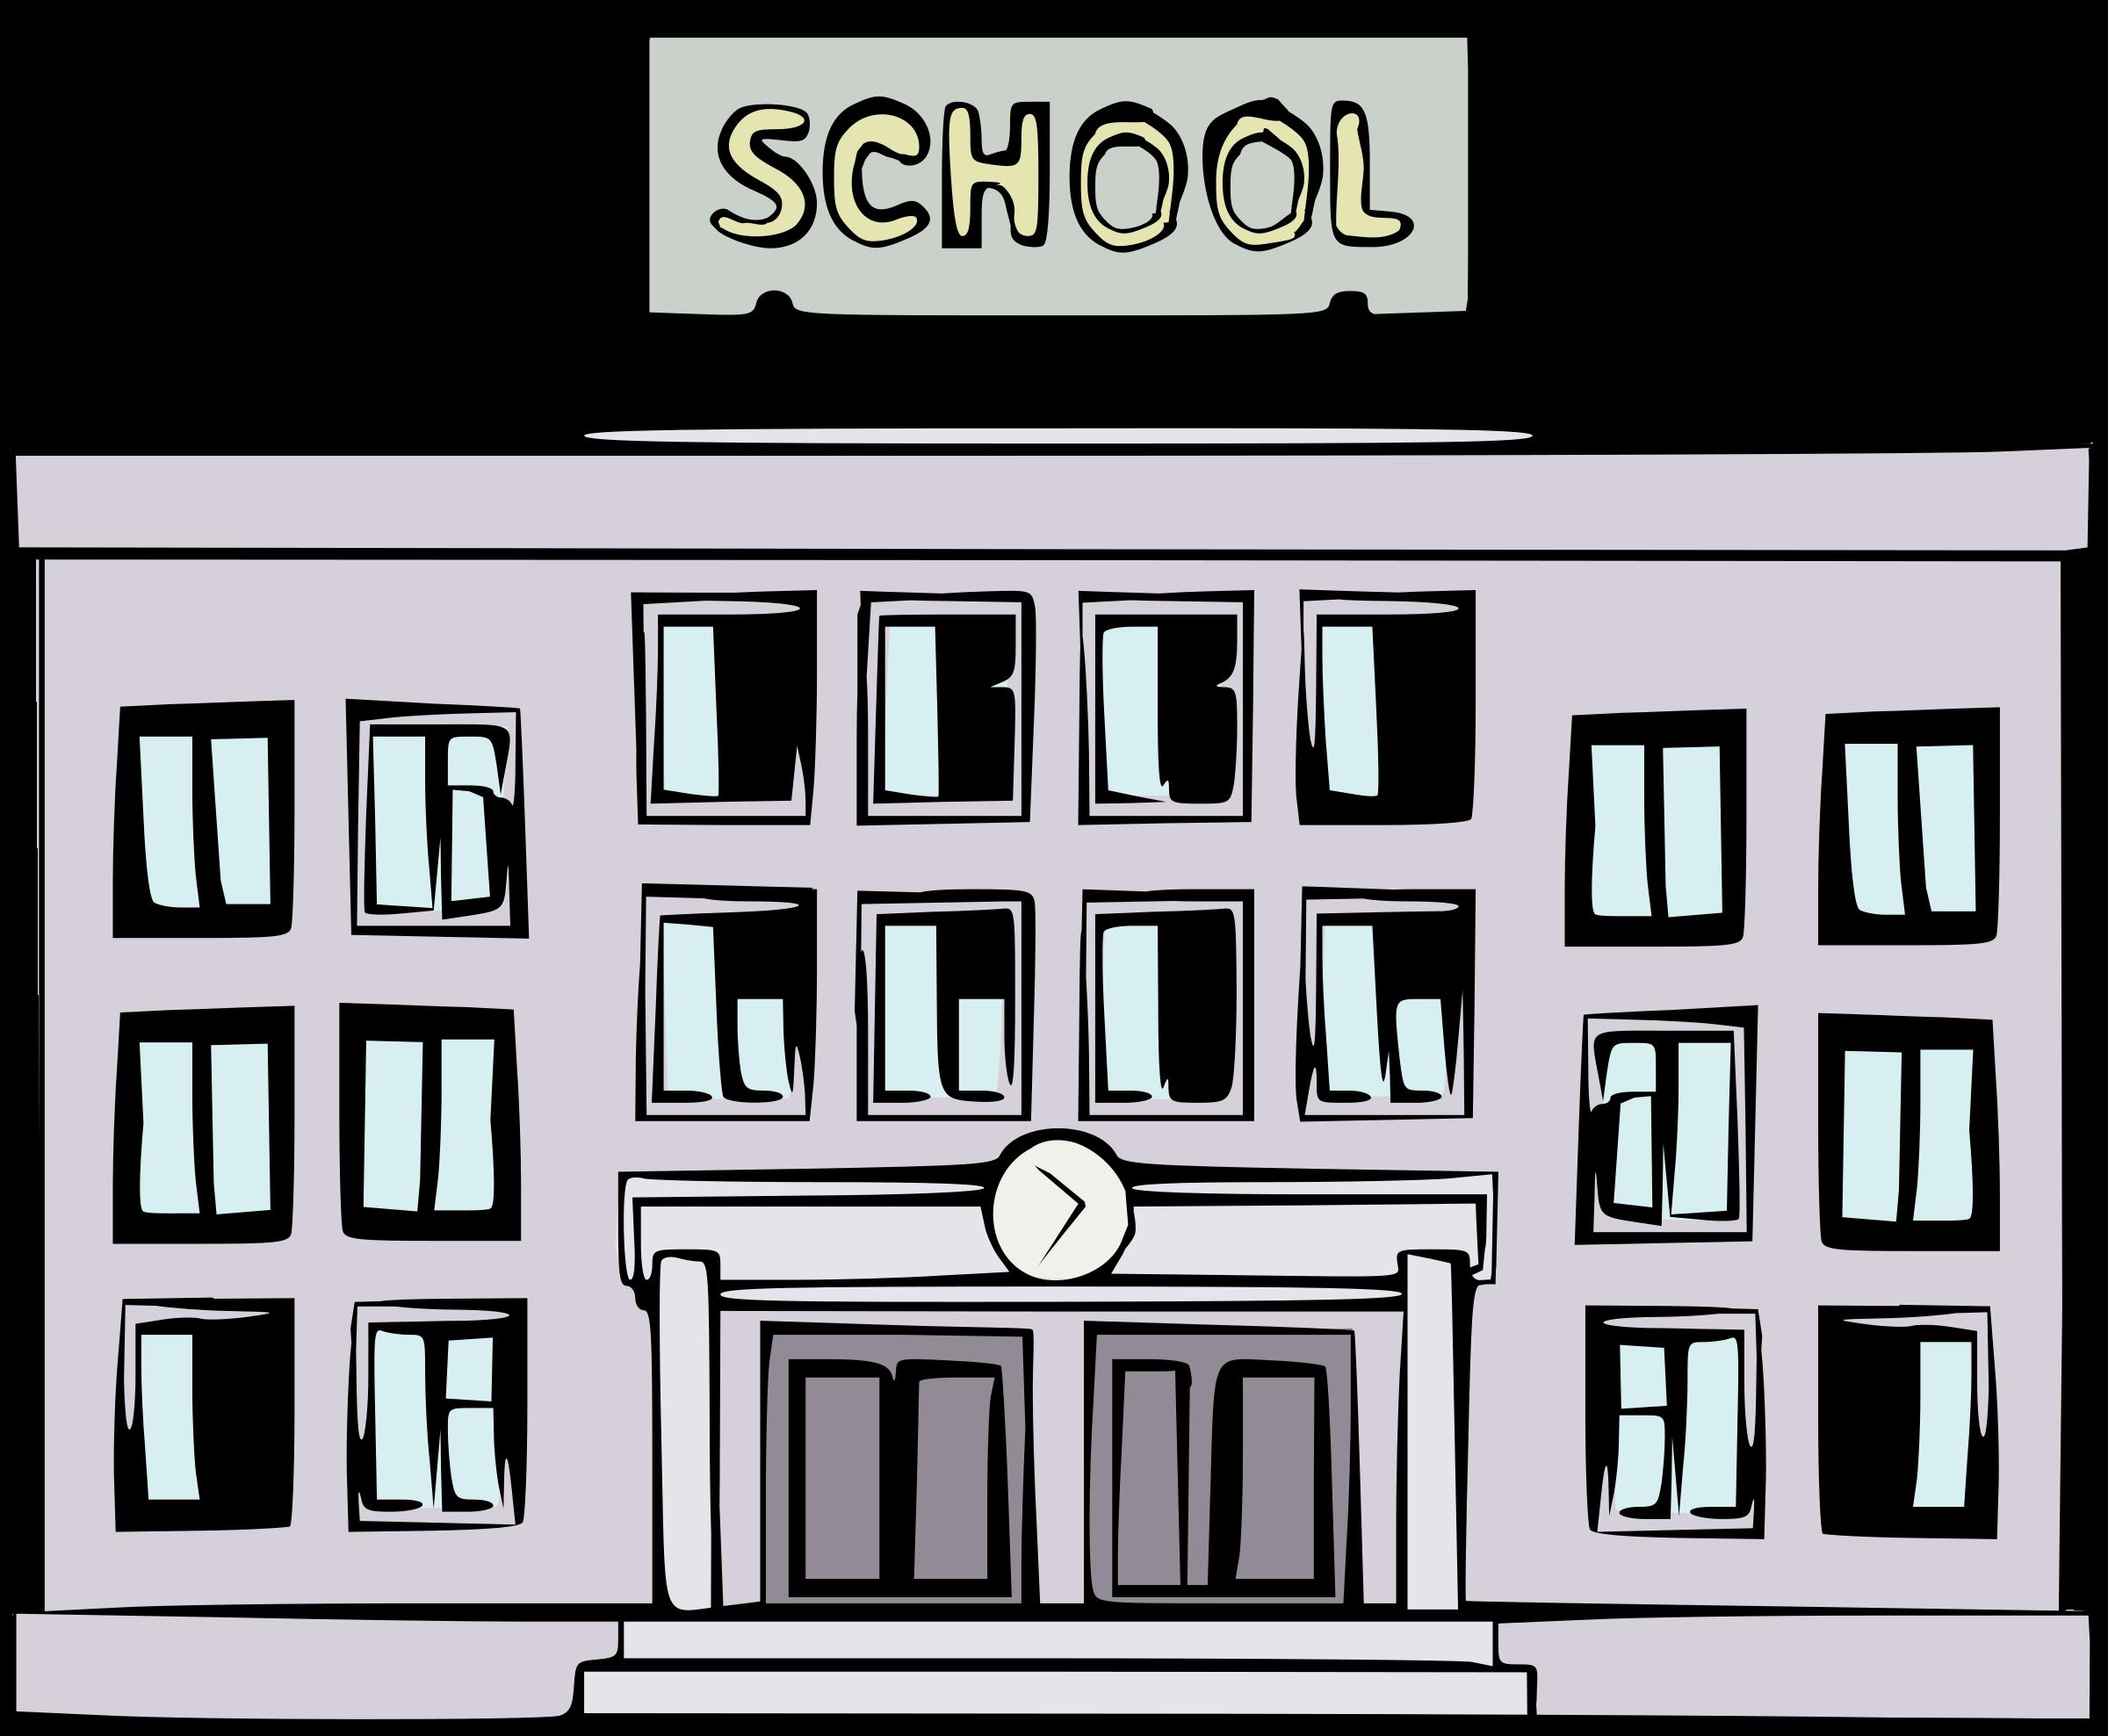 School - Colour by j4p4n